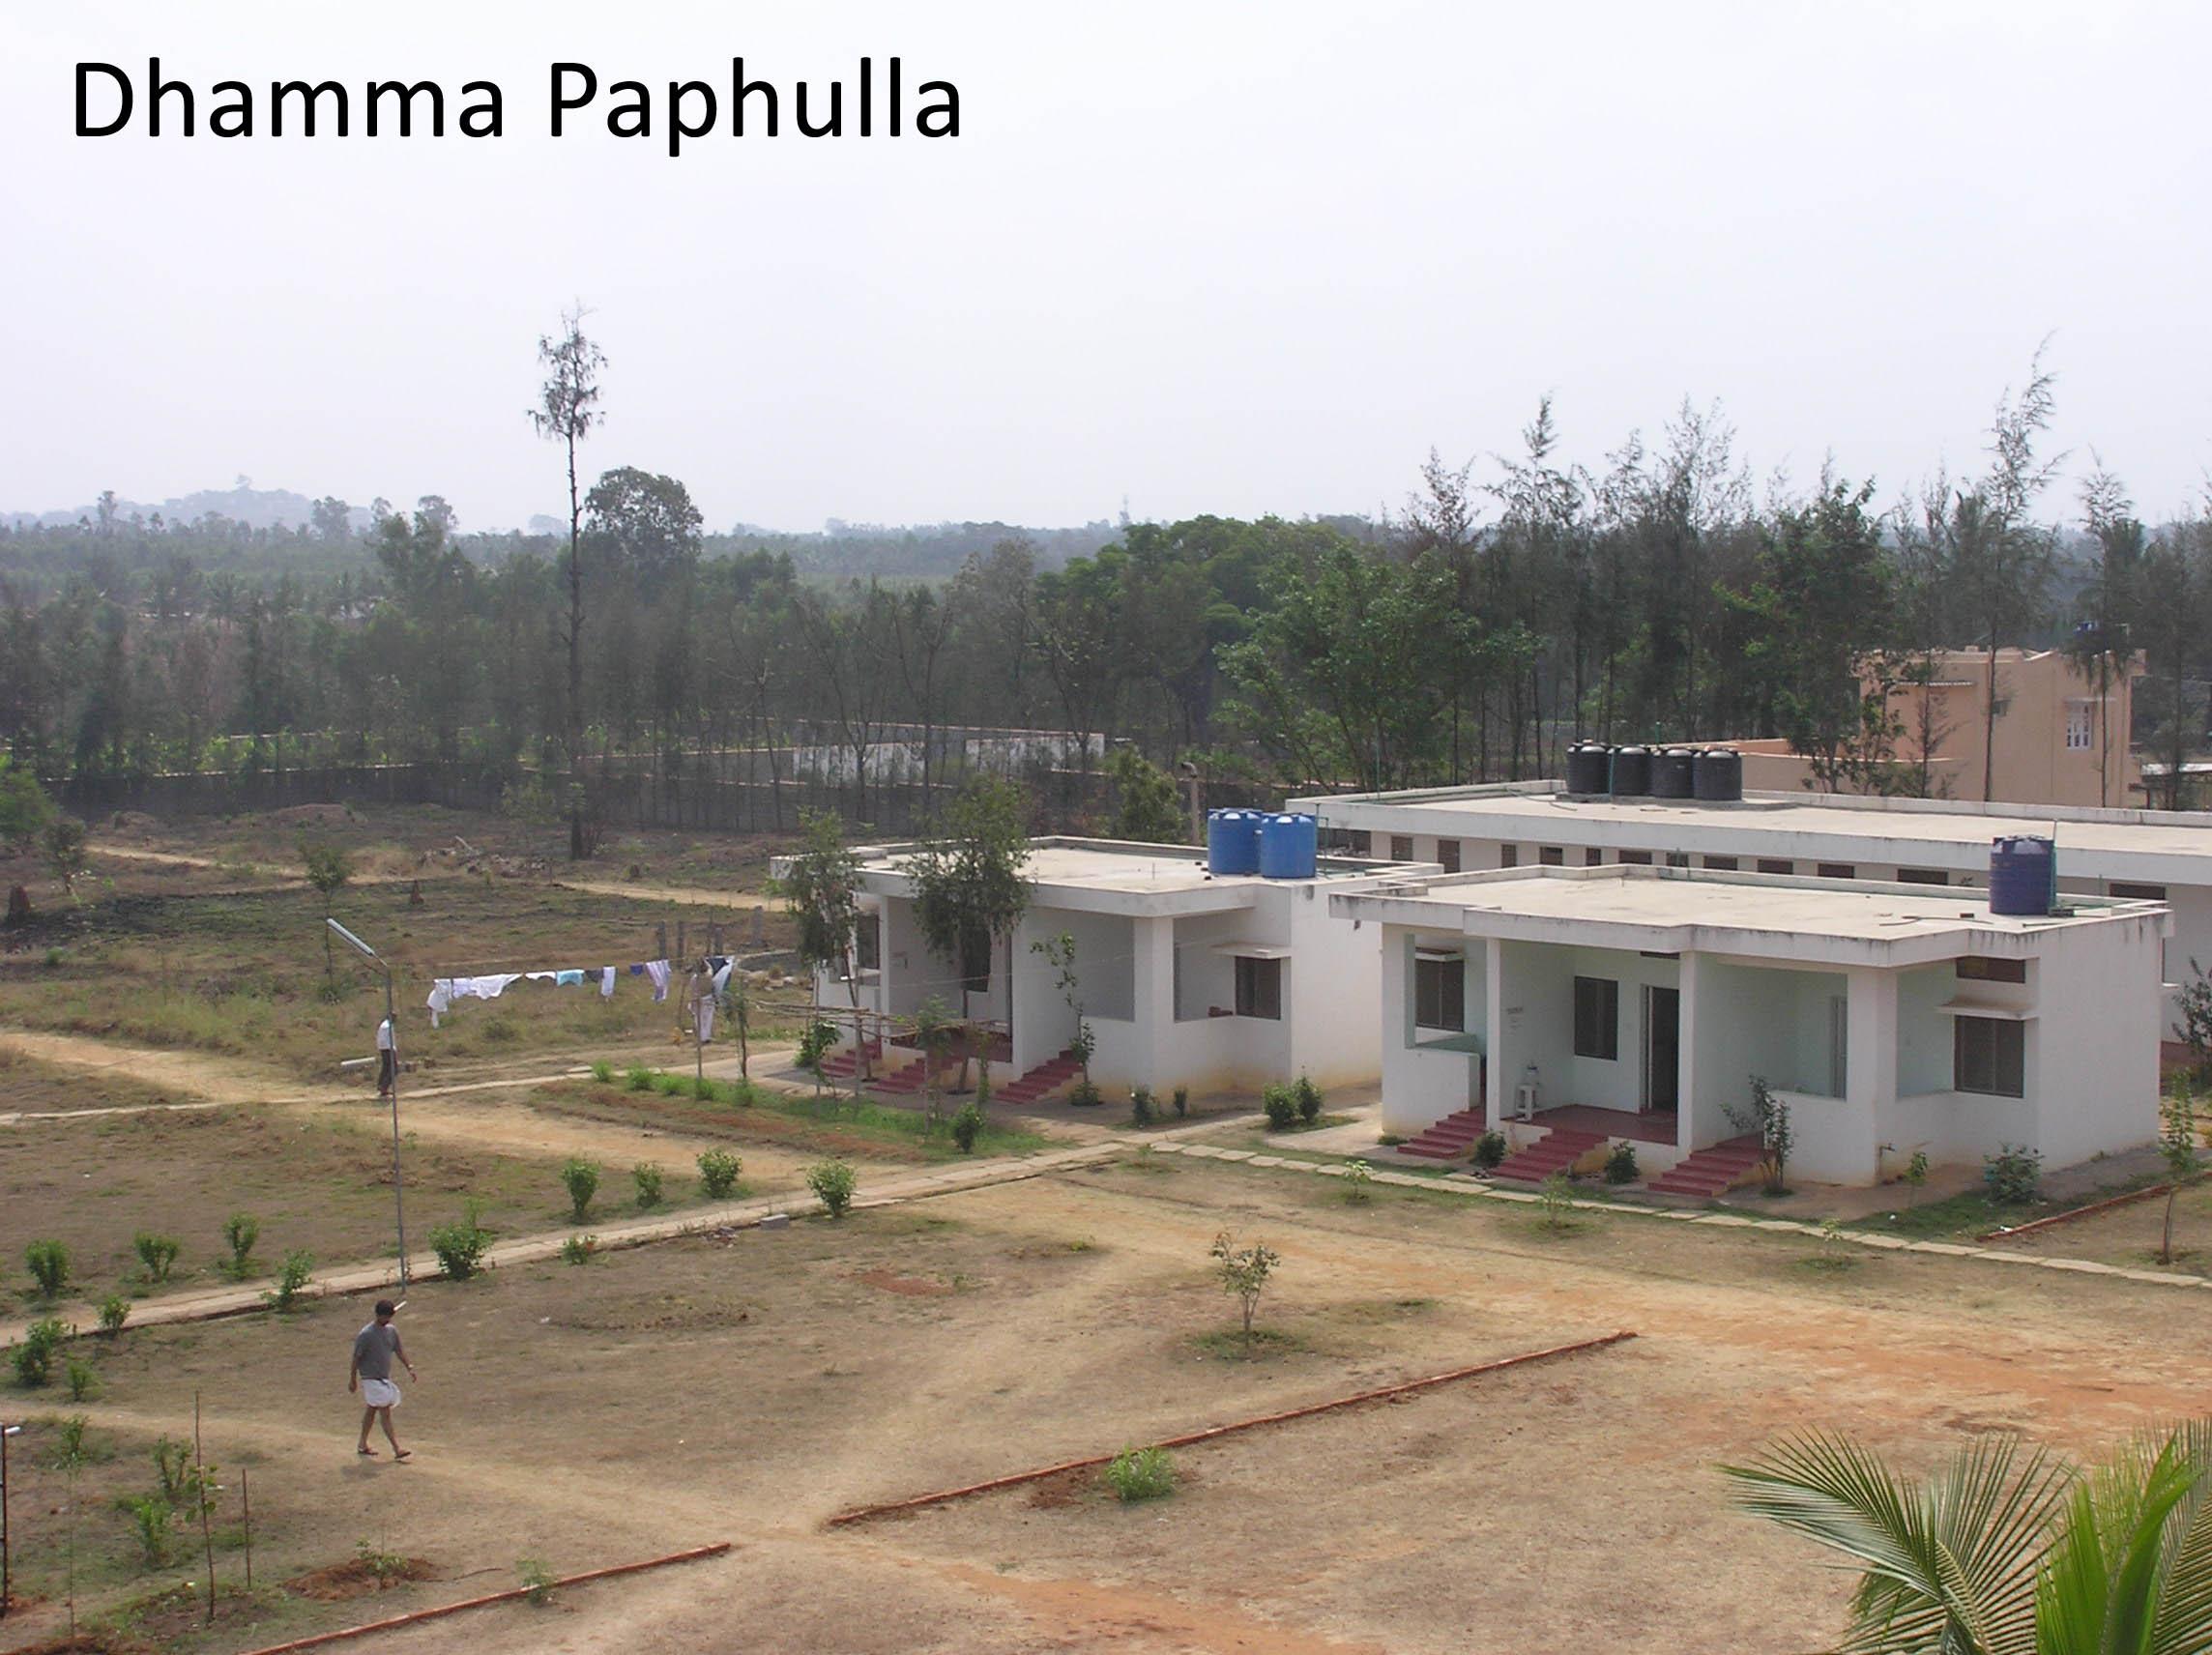 dhamma-paphulla-4